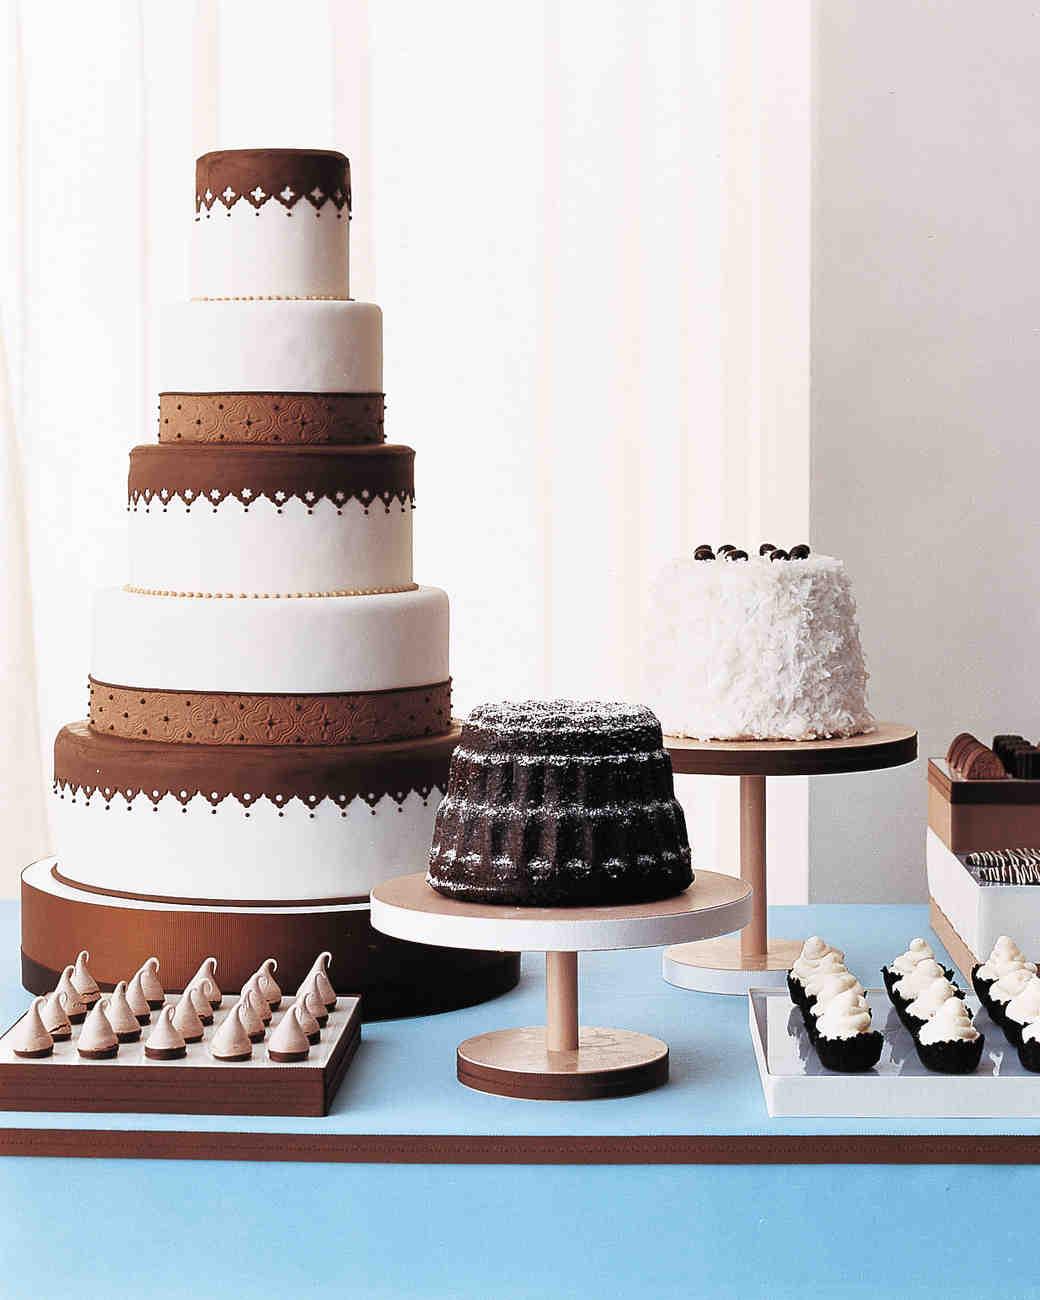 ron-ben-israel-cakes-winter-2004-chocolate-dessert-table-0814.jpg